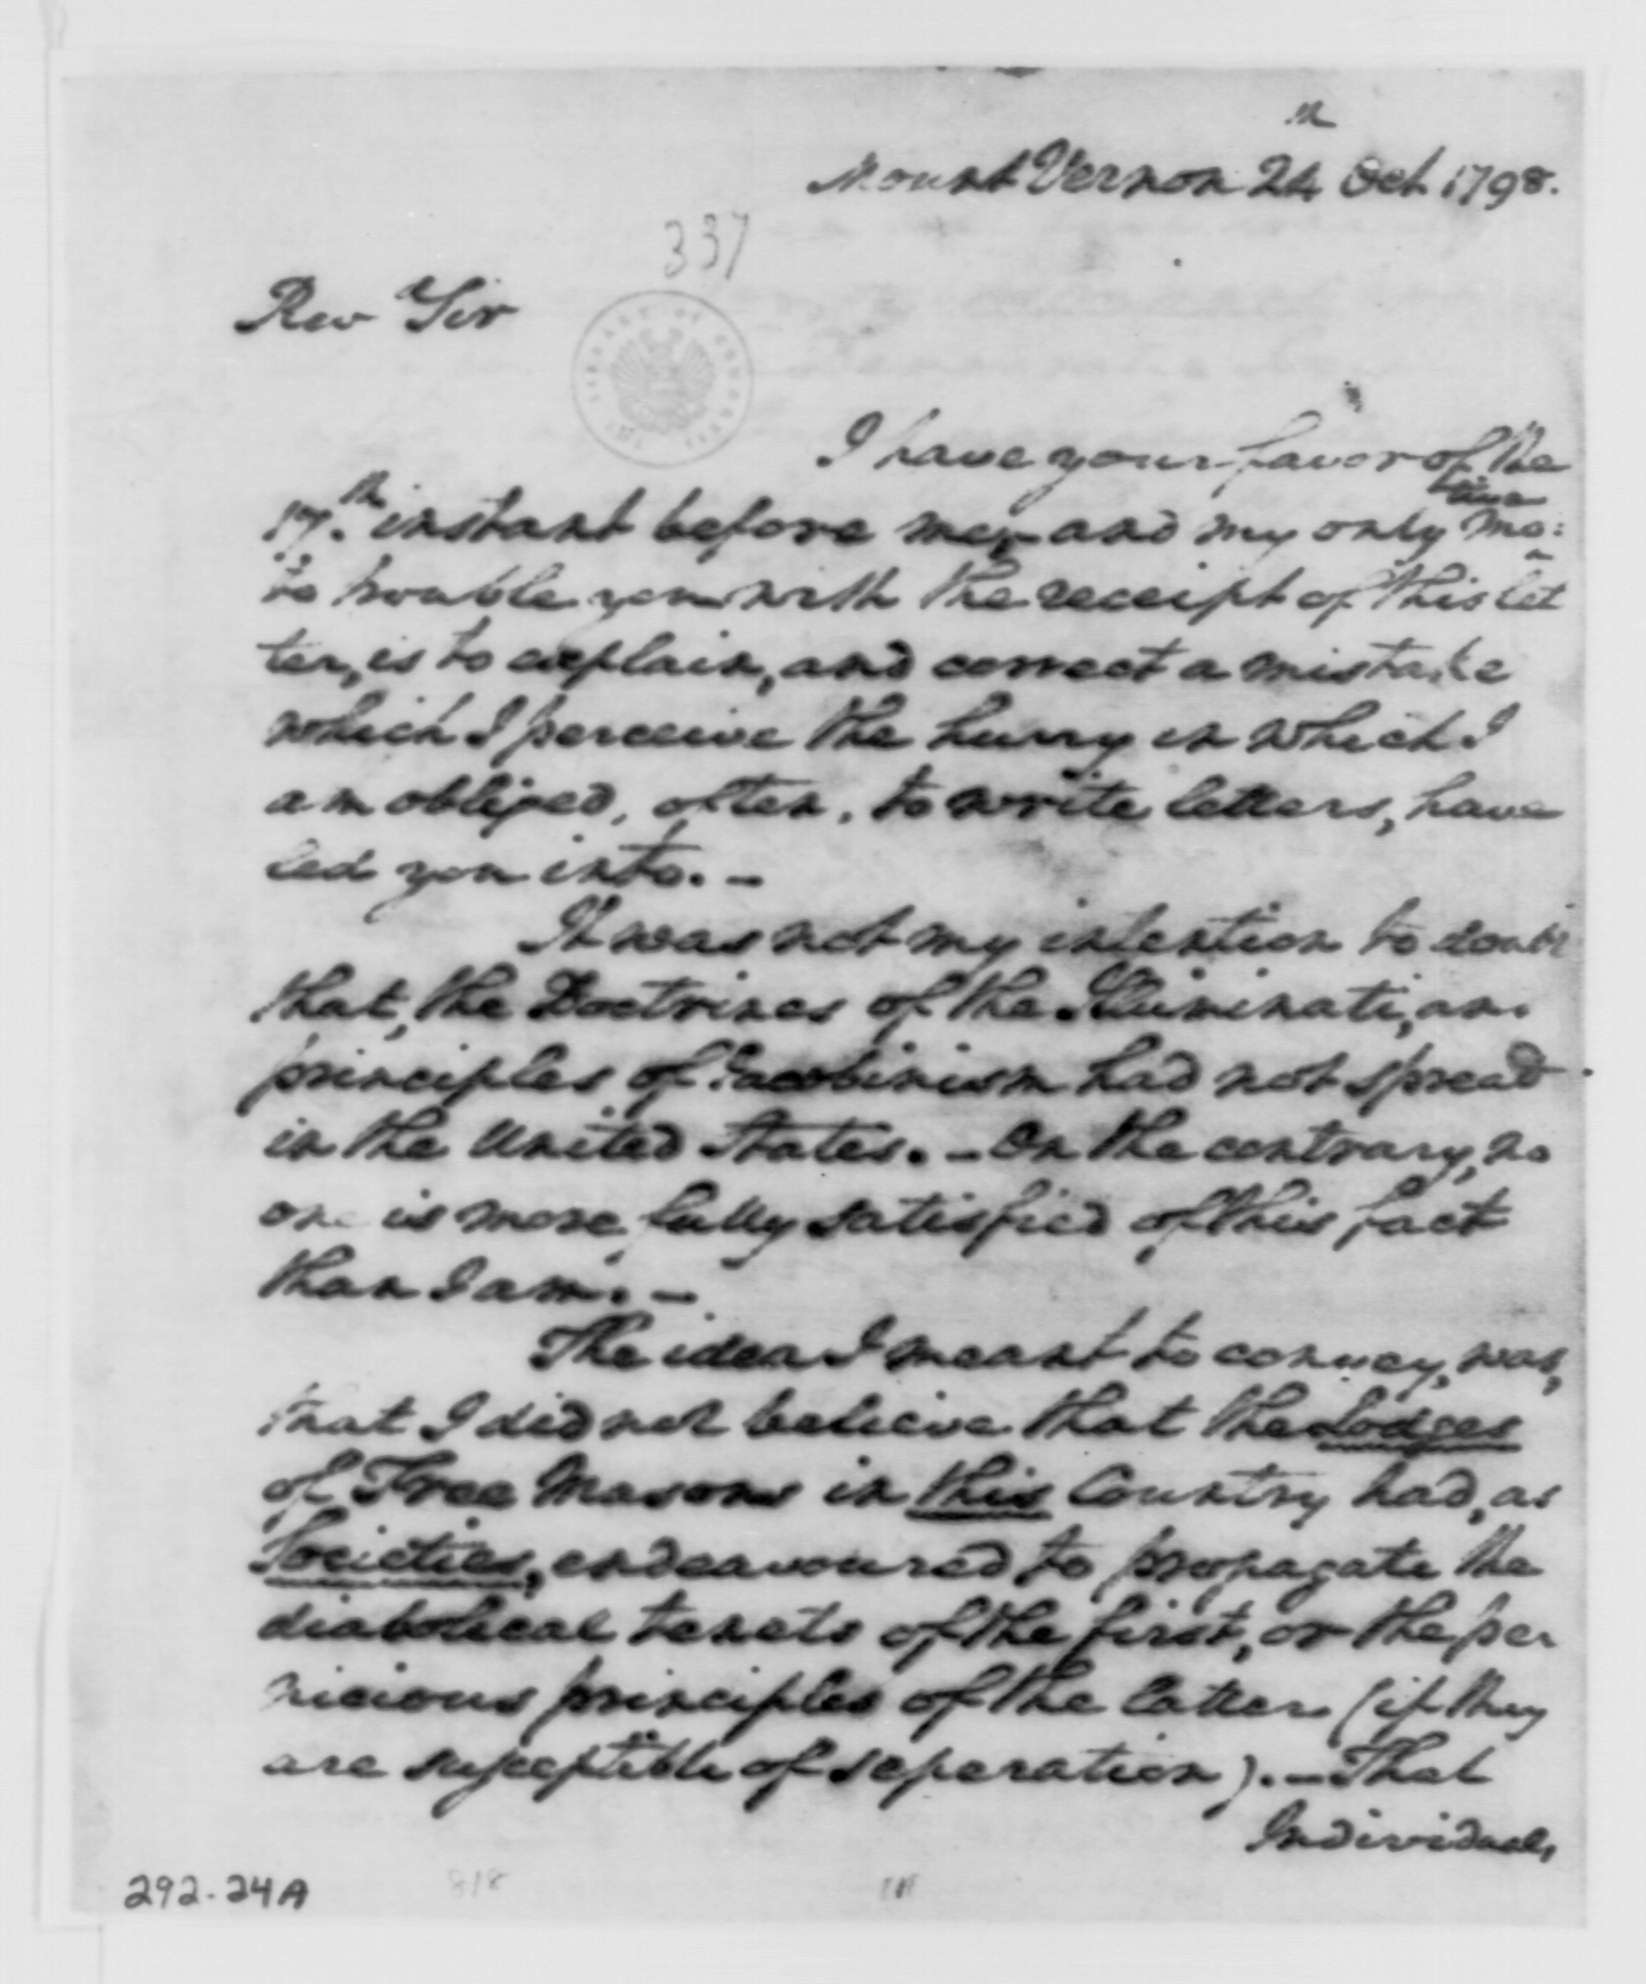 George Washington Illuminati Letter Oct 24th, 1798 - page 1 of 4